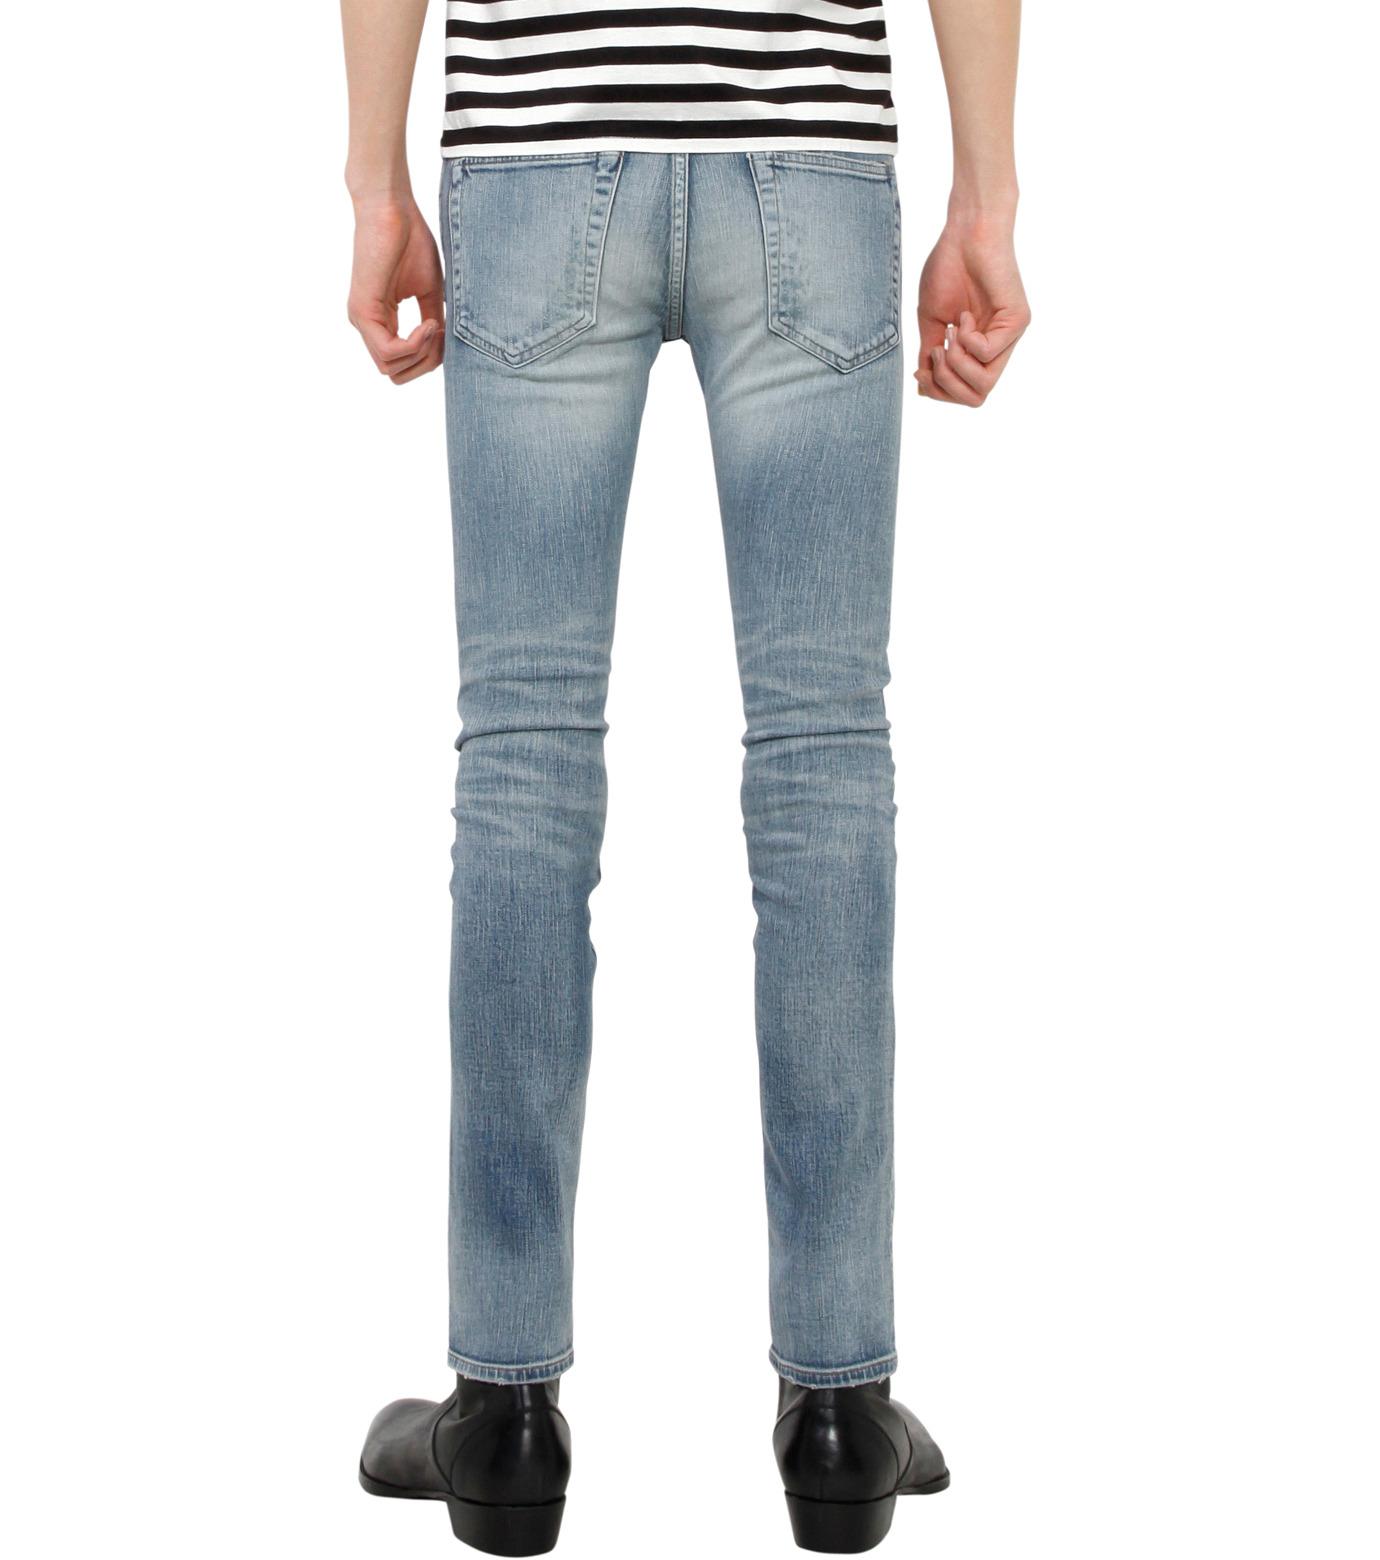 HL HEDDIE LOVU(エイチエル・エディールーヴ)のind damage3 skin slim-BLUE(パンツ/pants)-18S98002-92 拡大詳細画像2